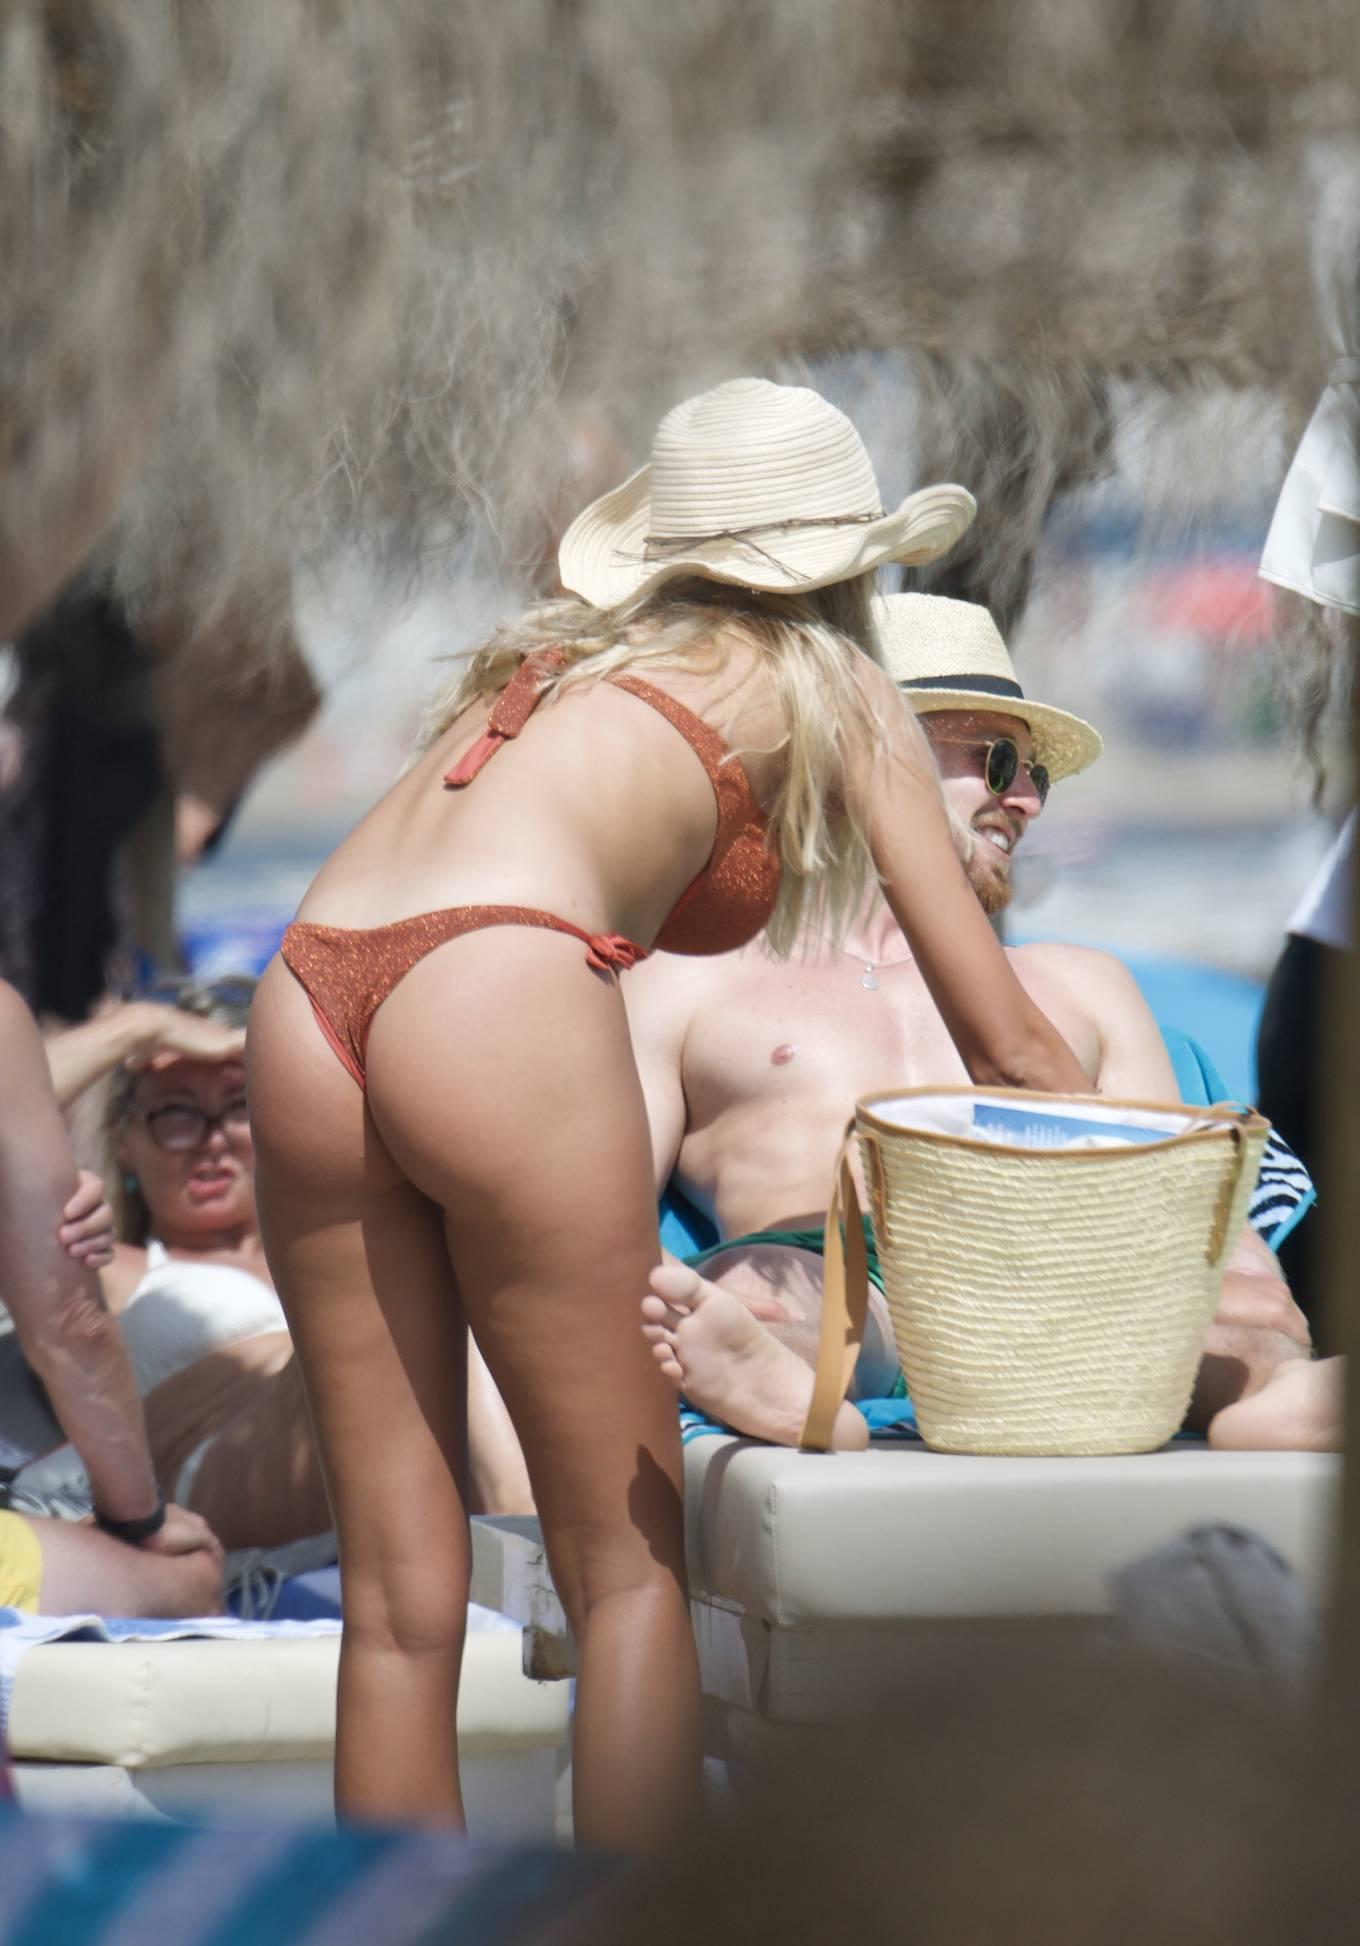 Zara McDermott 2020 : Zara McDermott in Bikini 2020-16